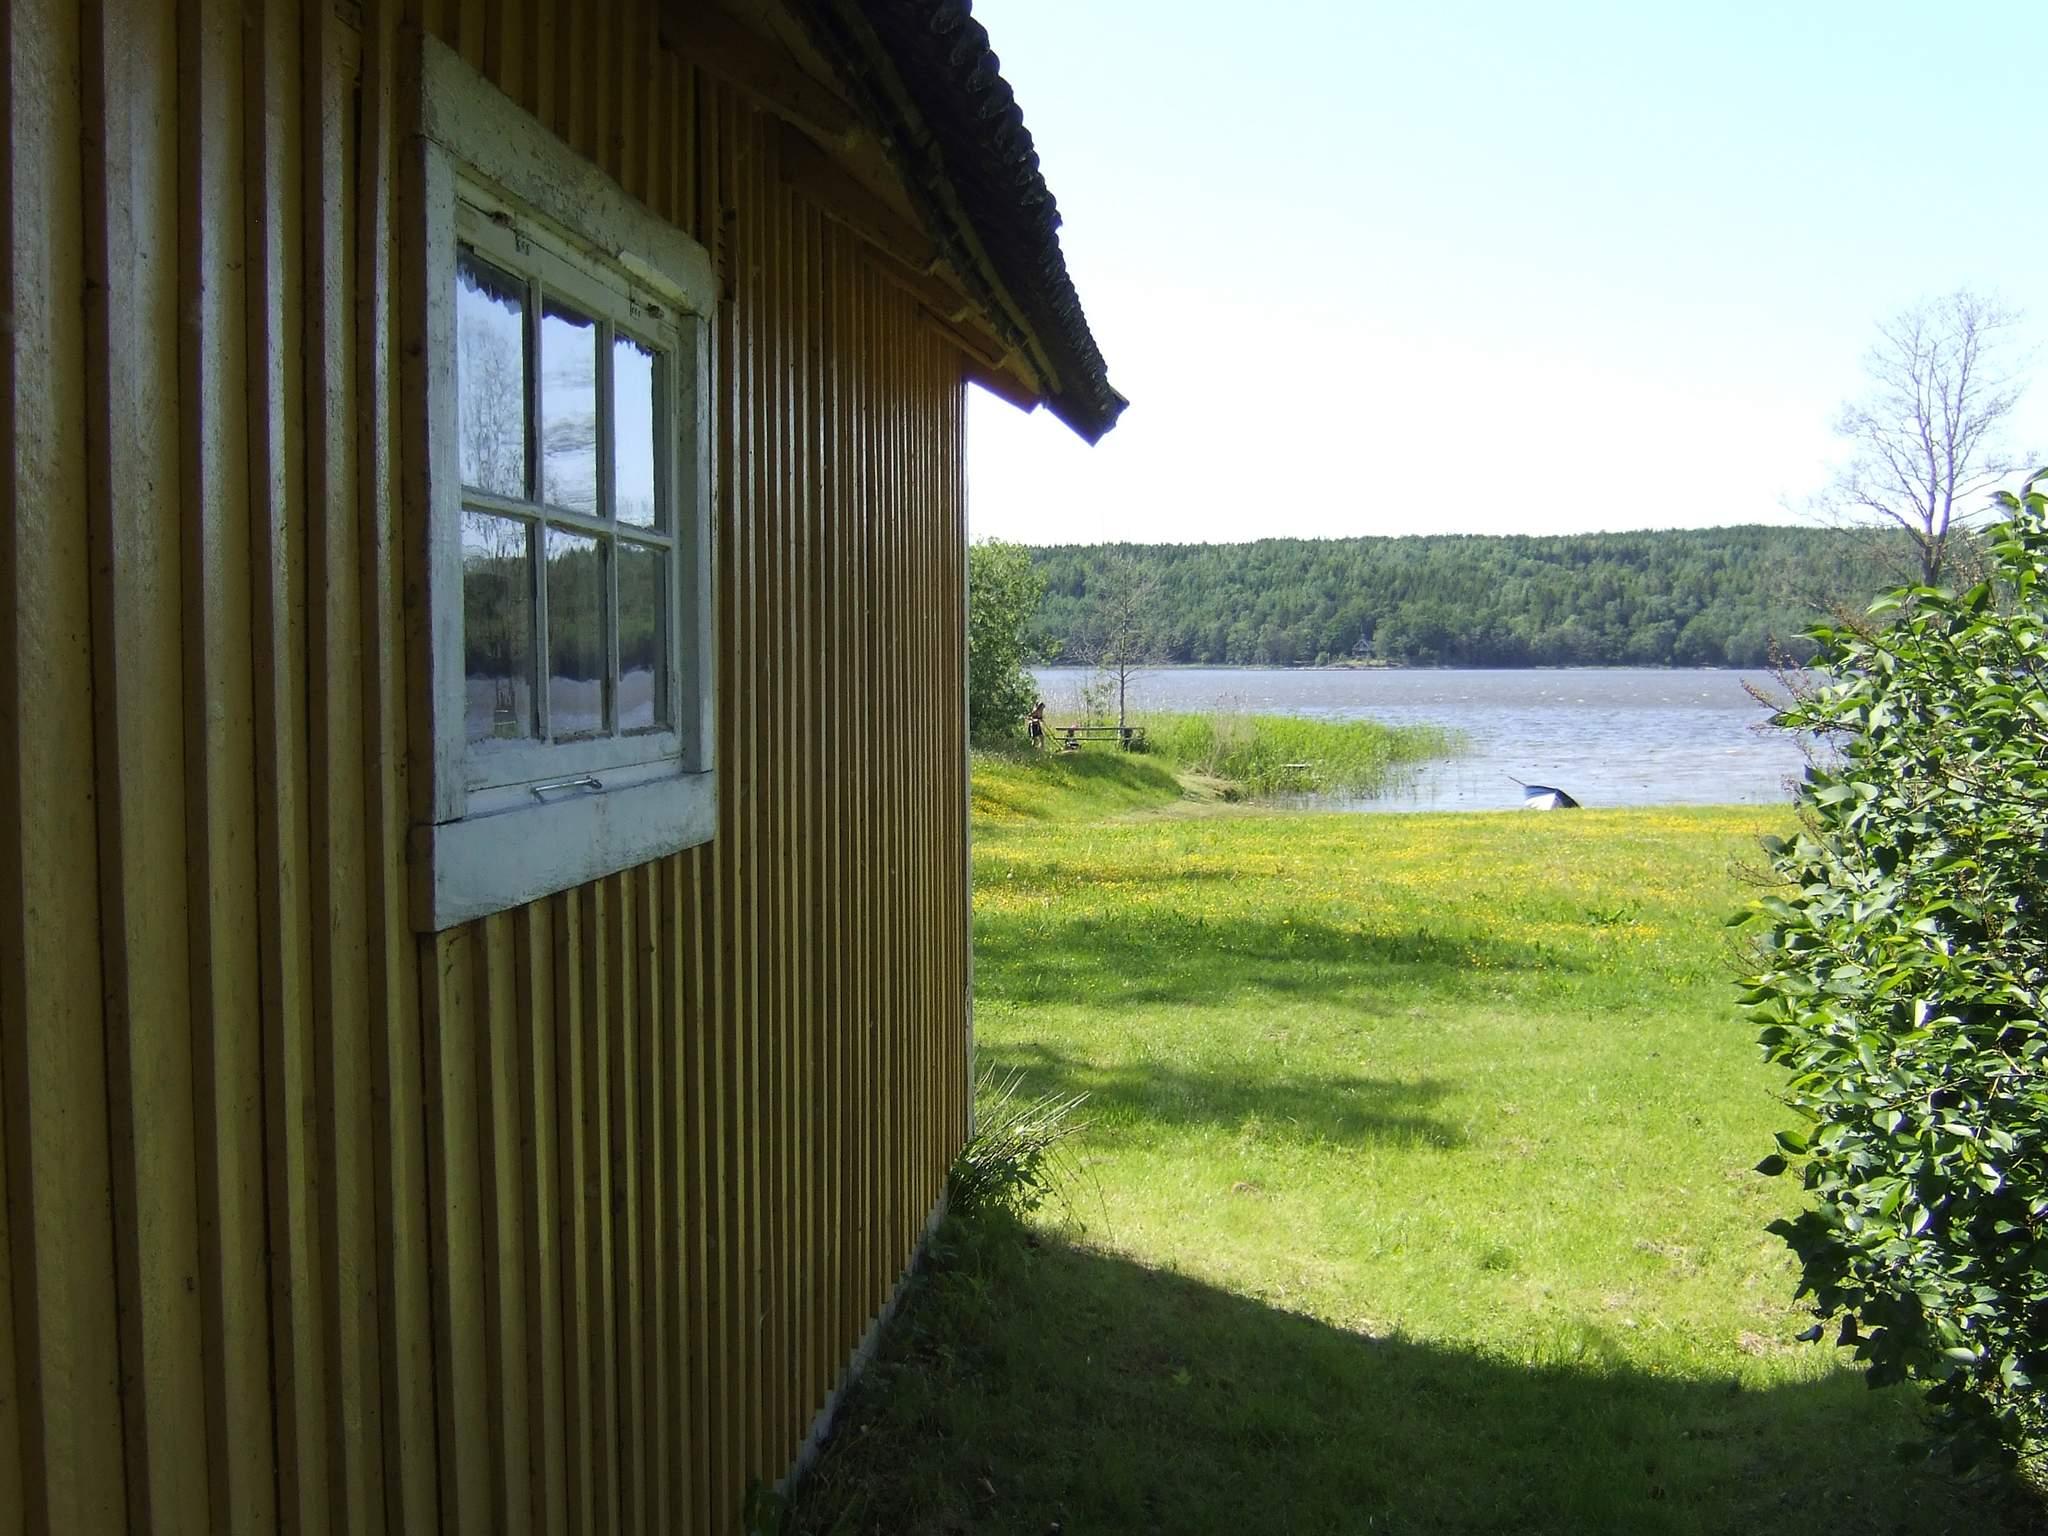 Ferienhaus Melldala (82014), Lerdala, Västra Götaland län, Westschweden, Schweden, Bild 6